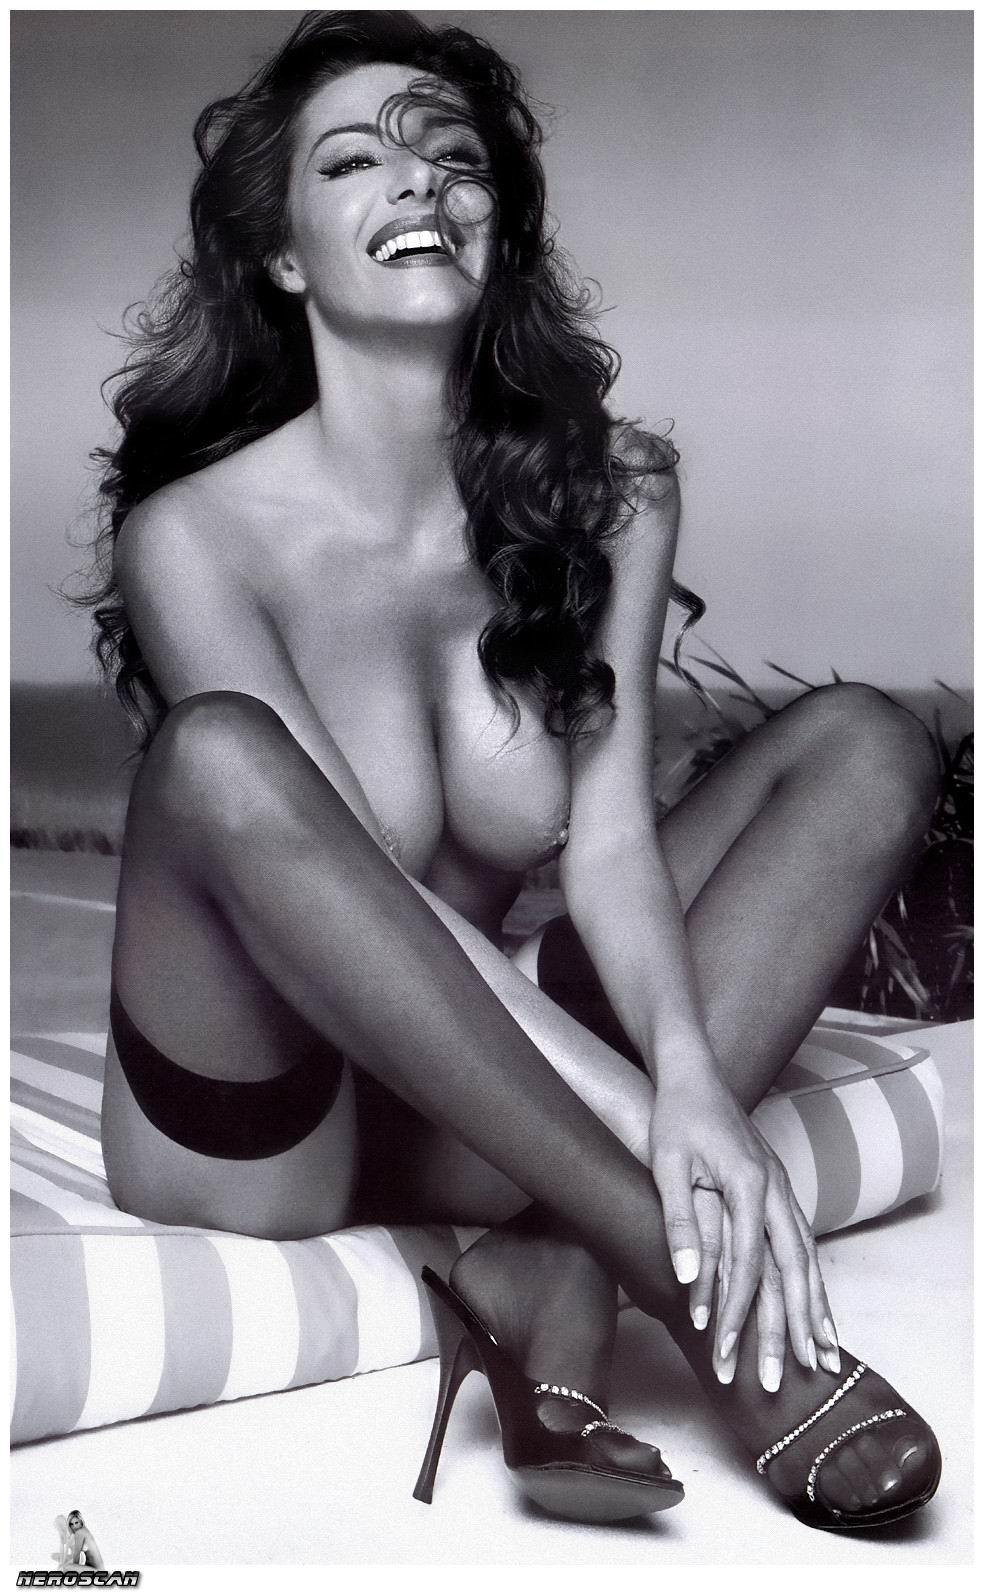 Emmanuel folliero anal, young girls suck dick porn